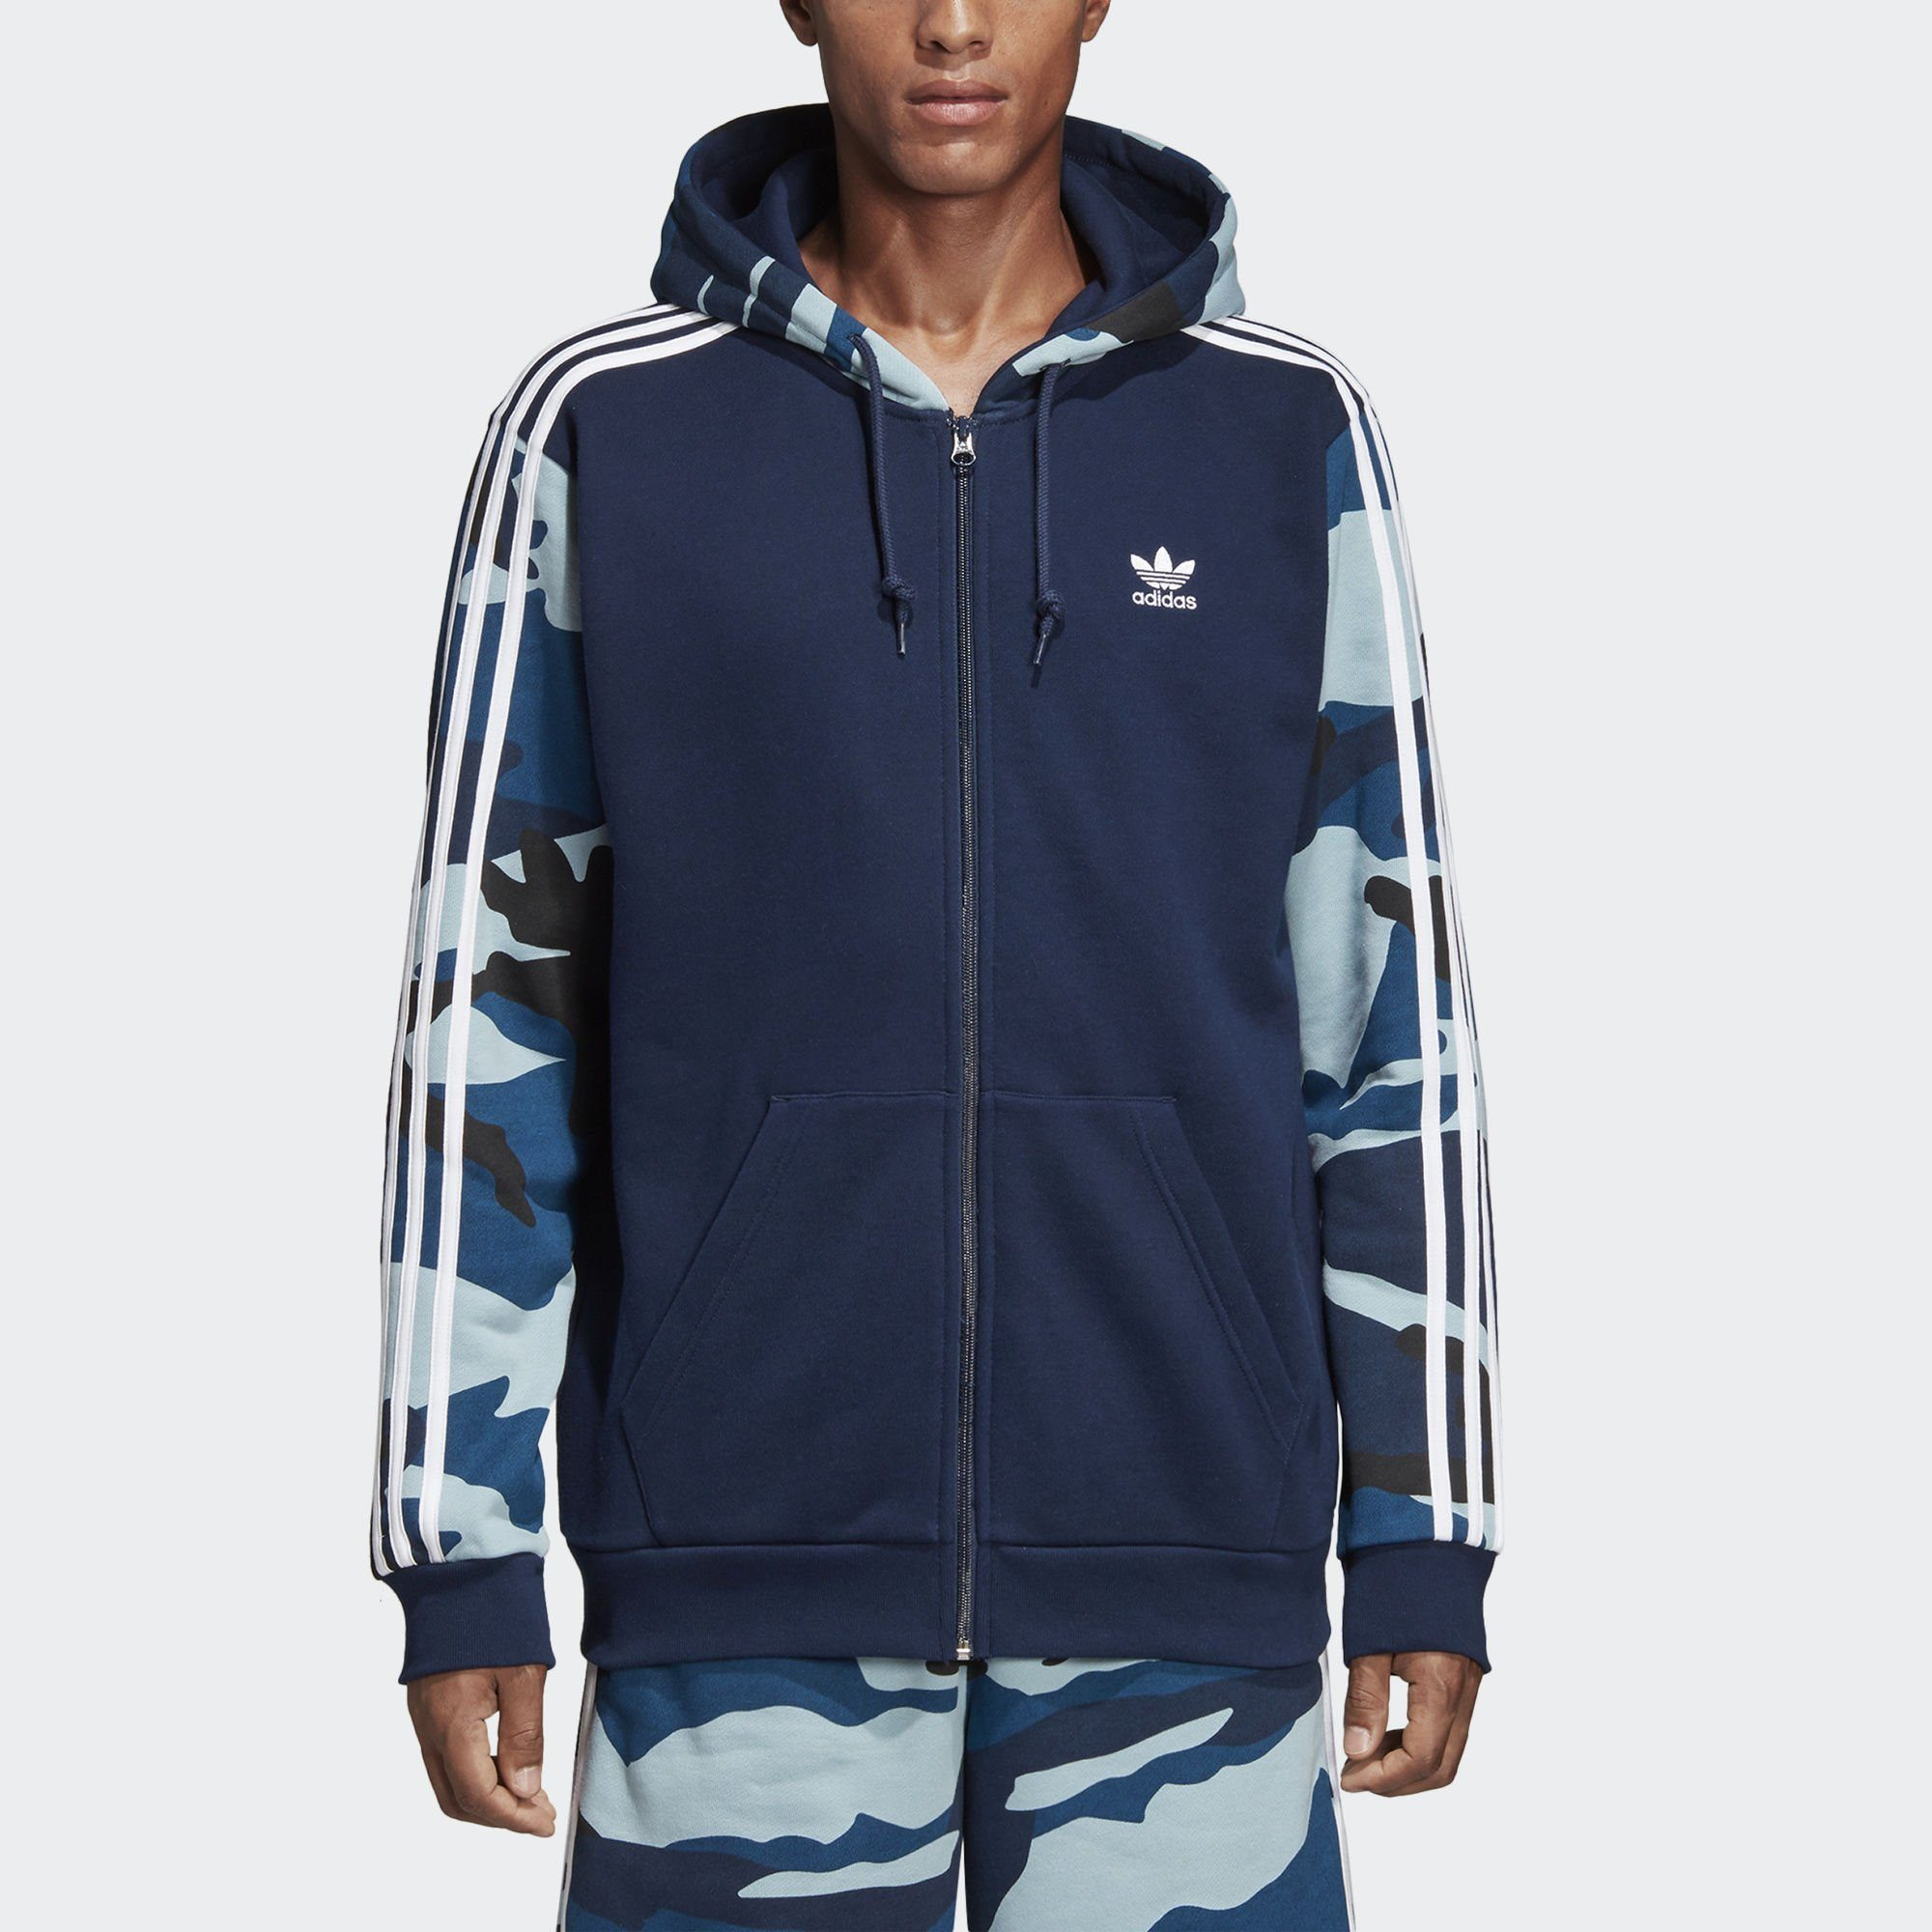 adidas Originals Funktions-Kapuzensweatjacke »Camouflage Kapuzenjacke«